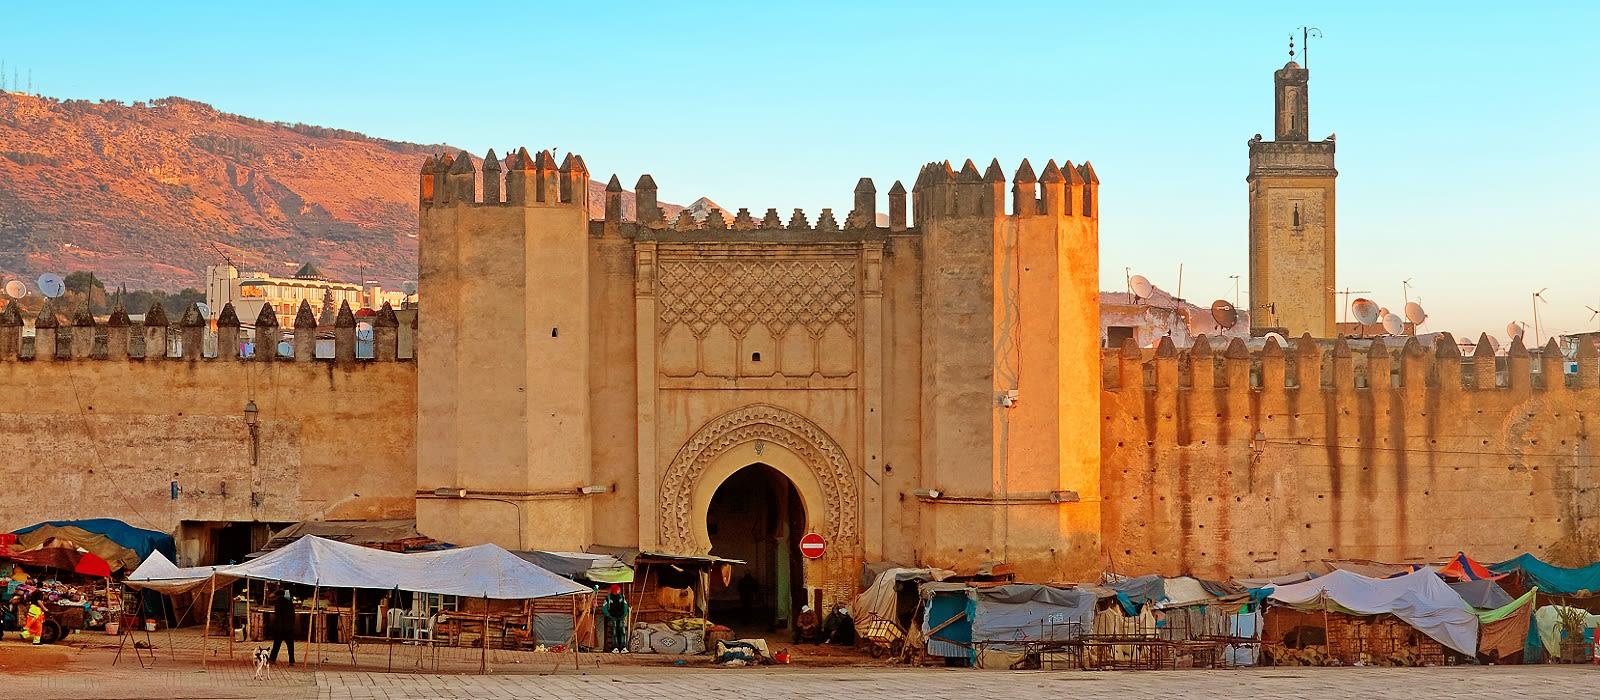 Hin-& Rückflug nach Marokko (Fès) für 34,88€